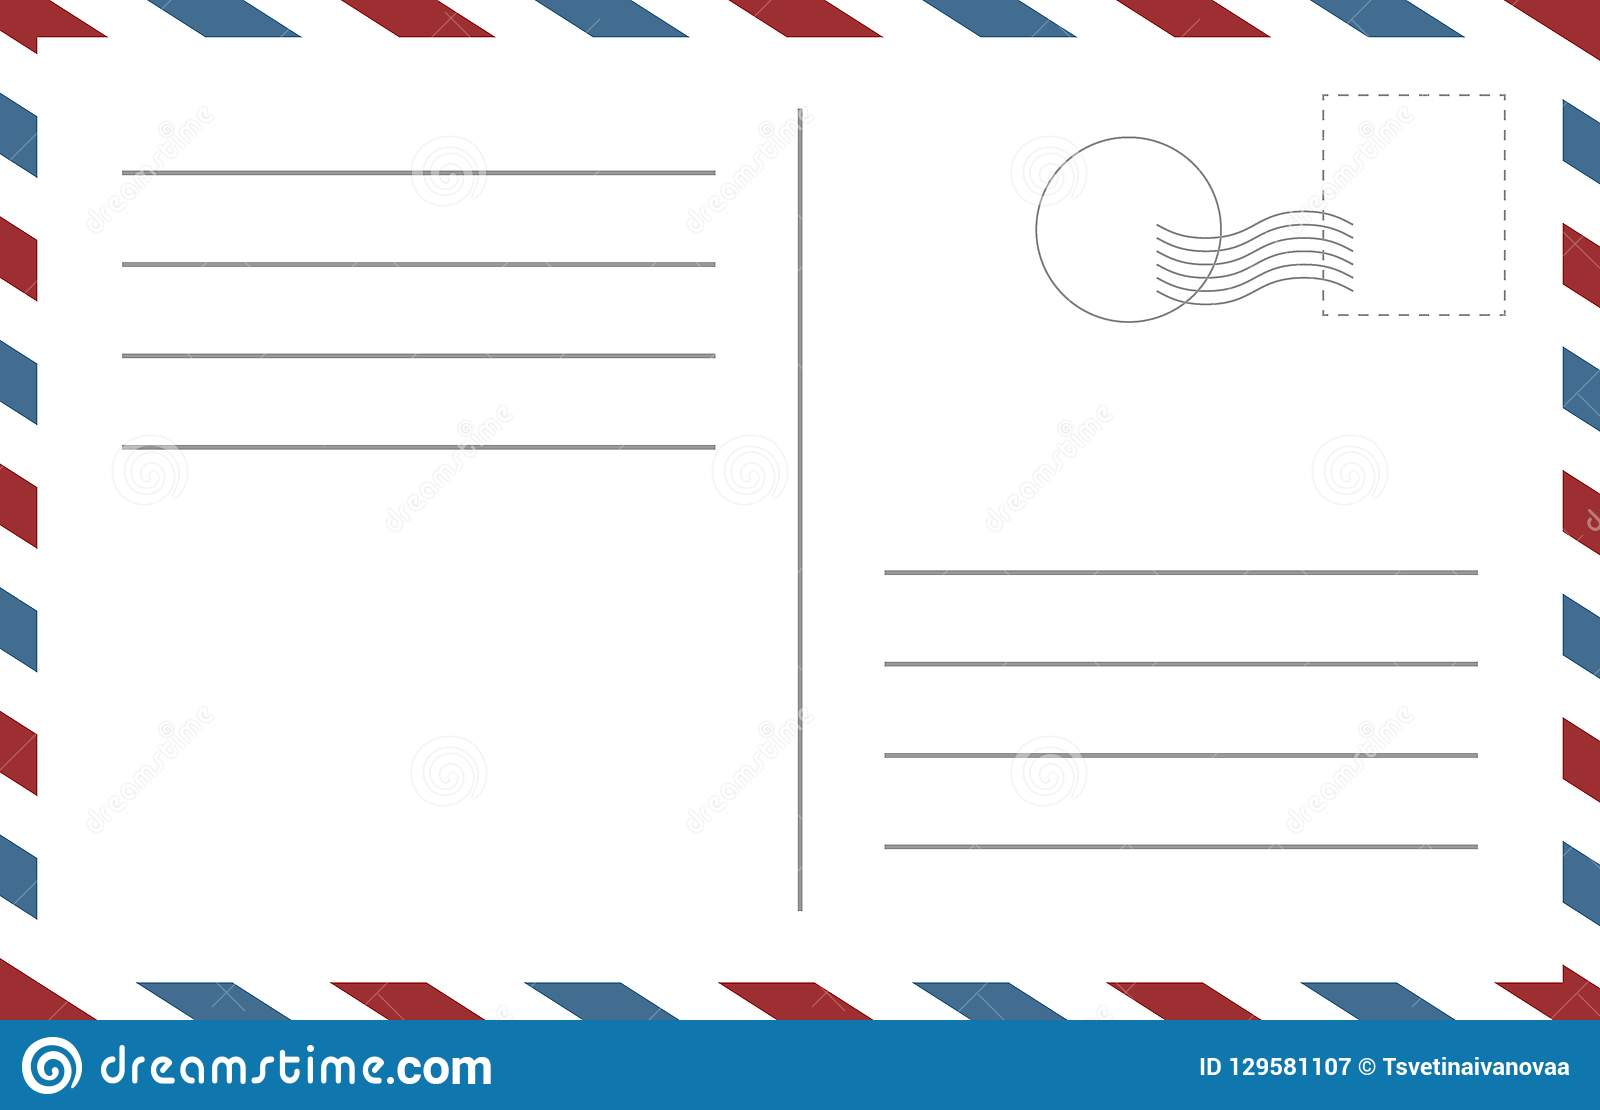 Blank postcard template. Backside of a postcart design vector blank template